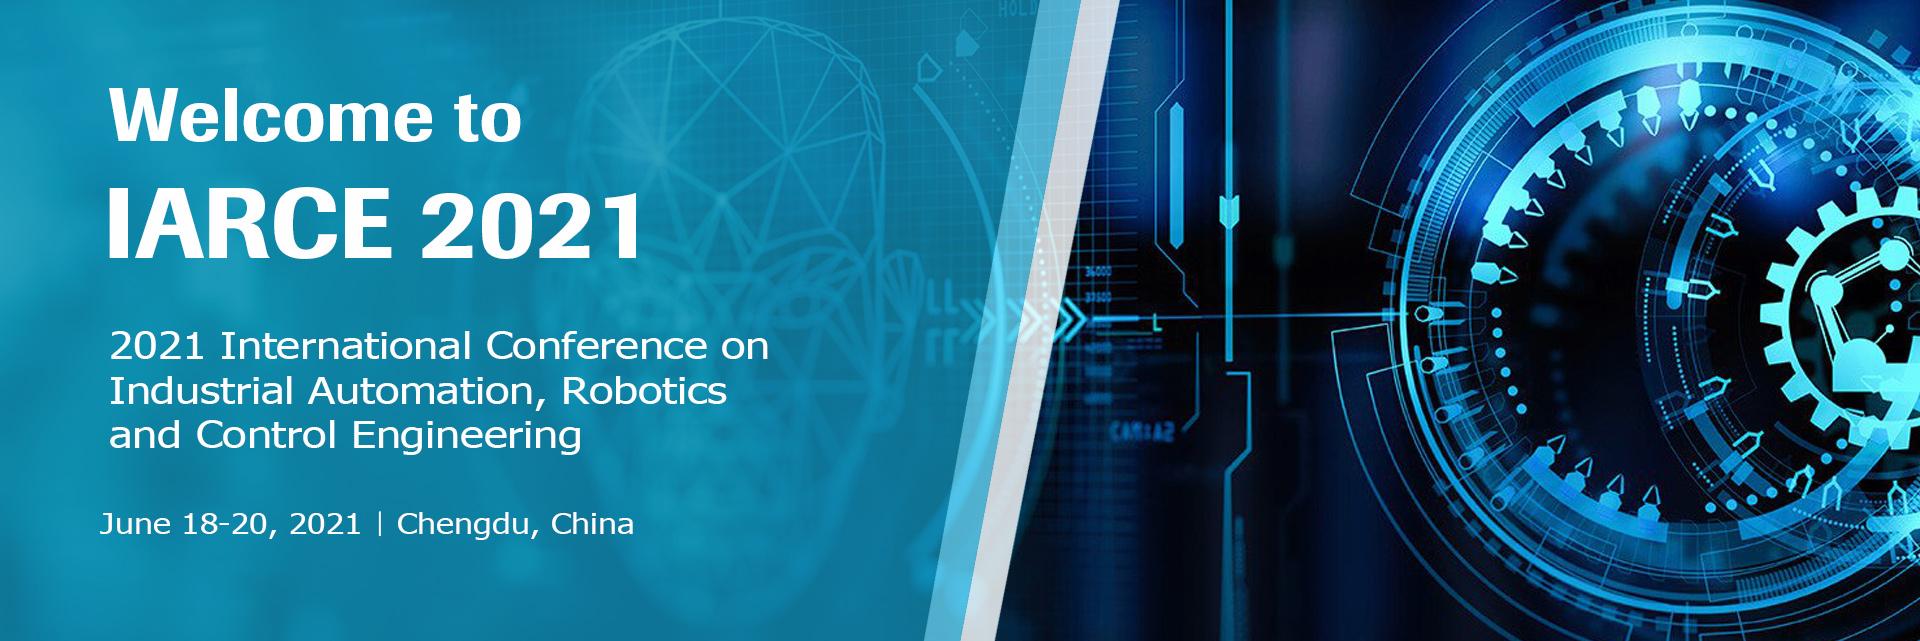 Industrial Automation, Robotics and Control Engineering (IARCE 2021)